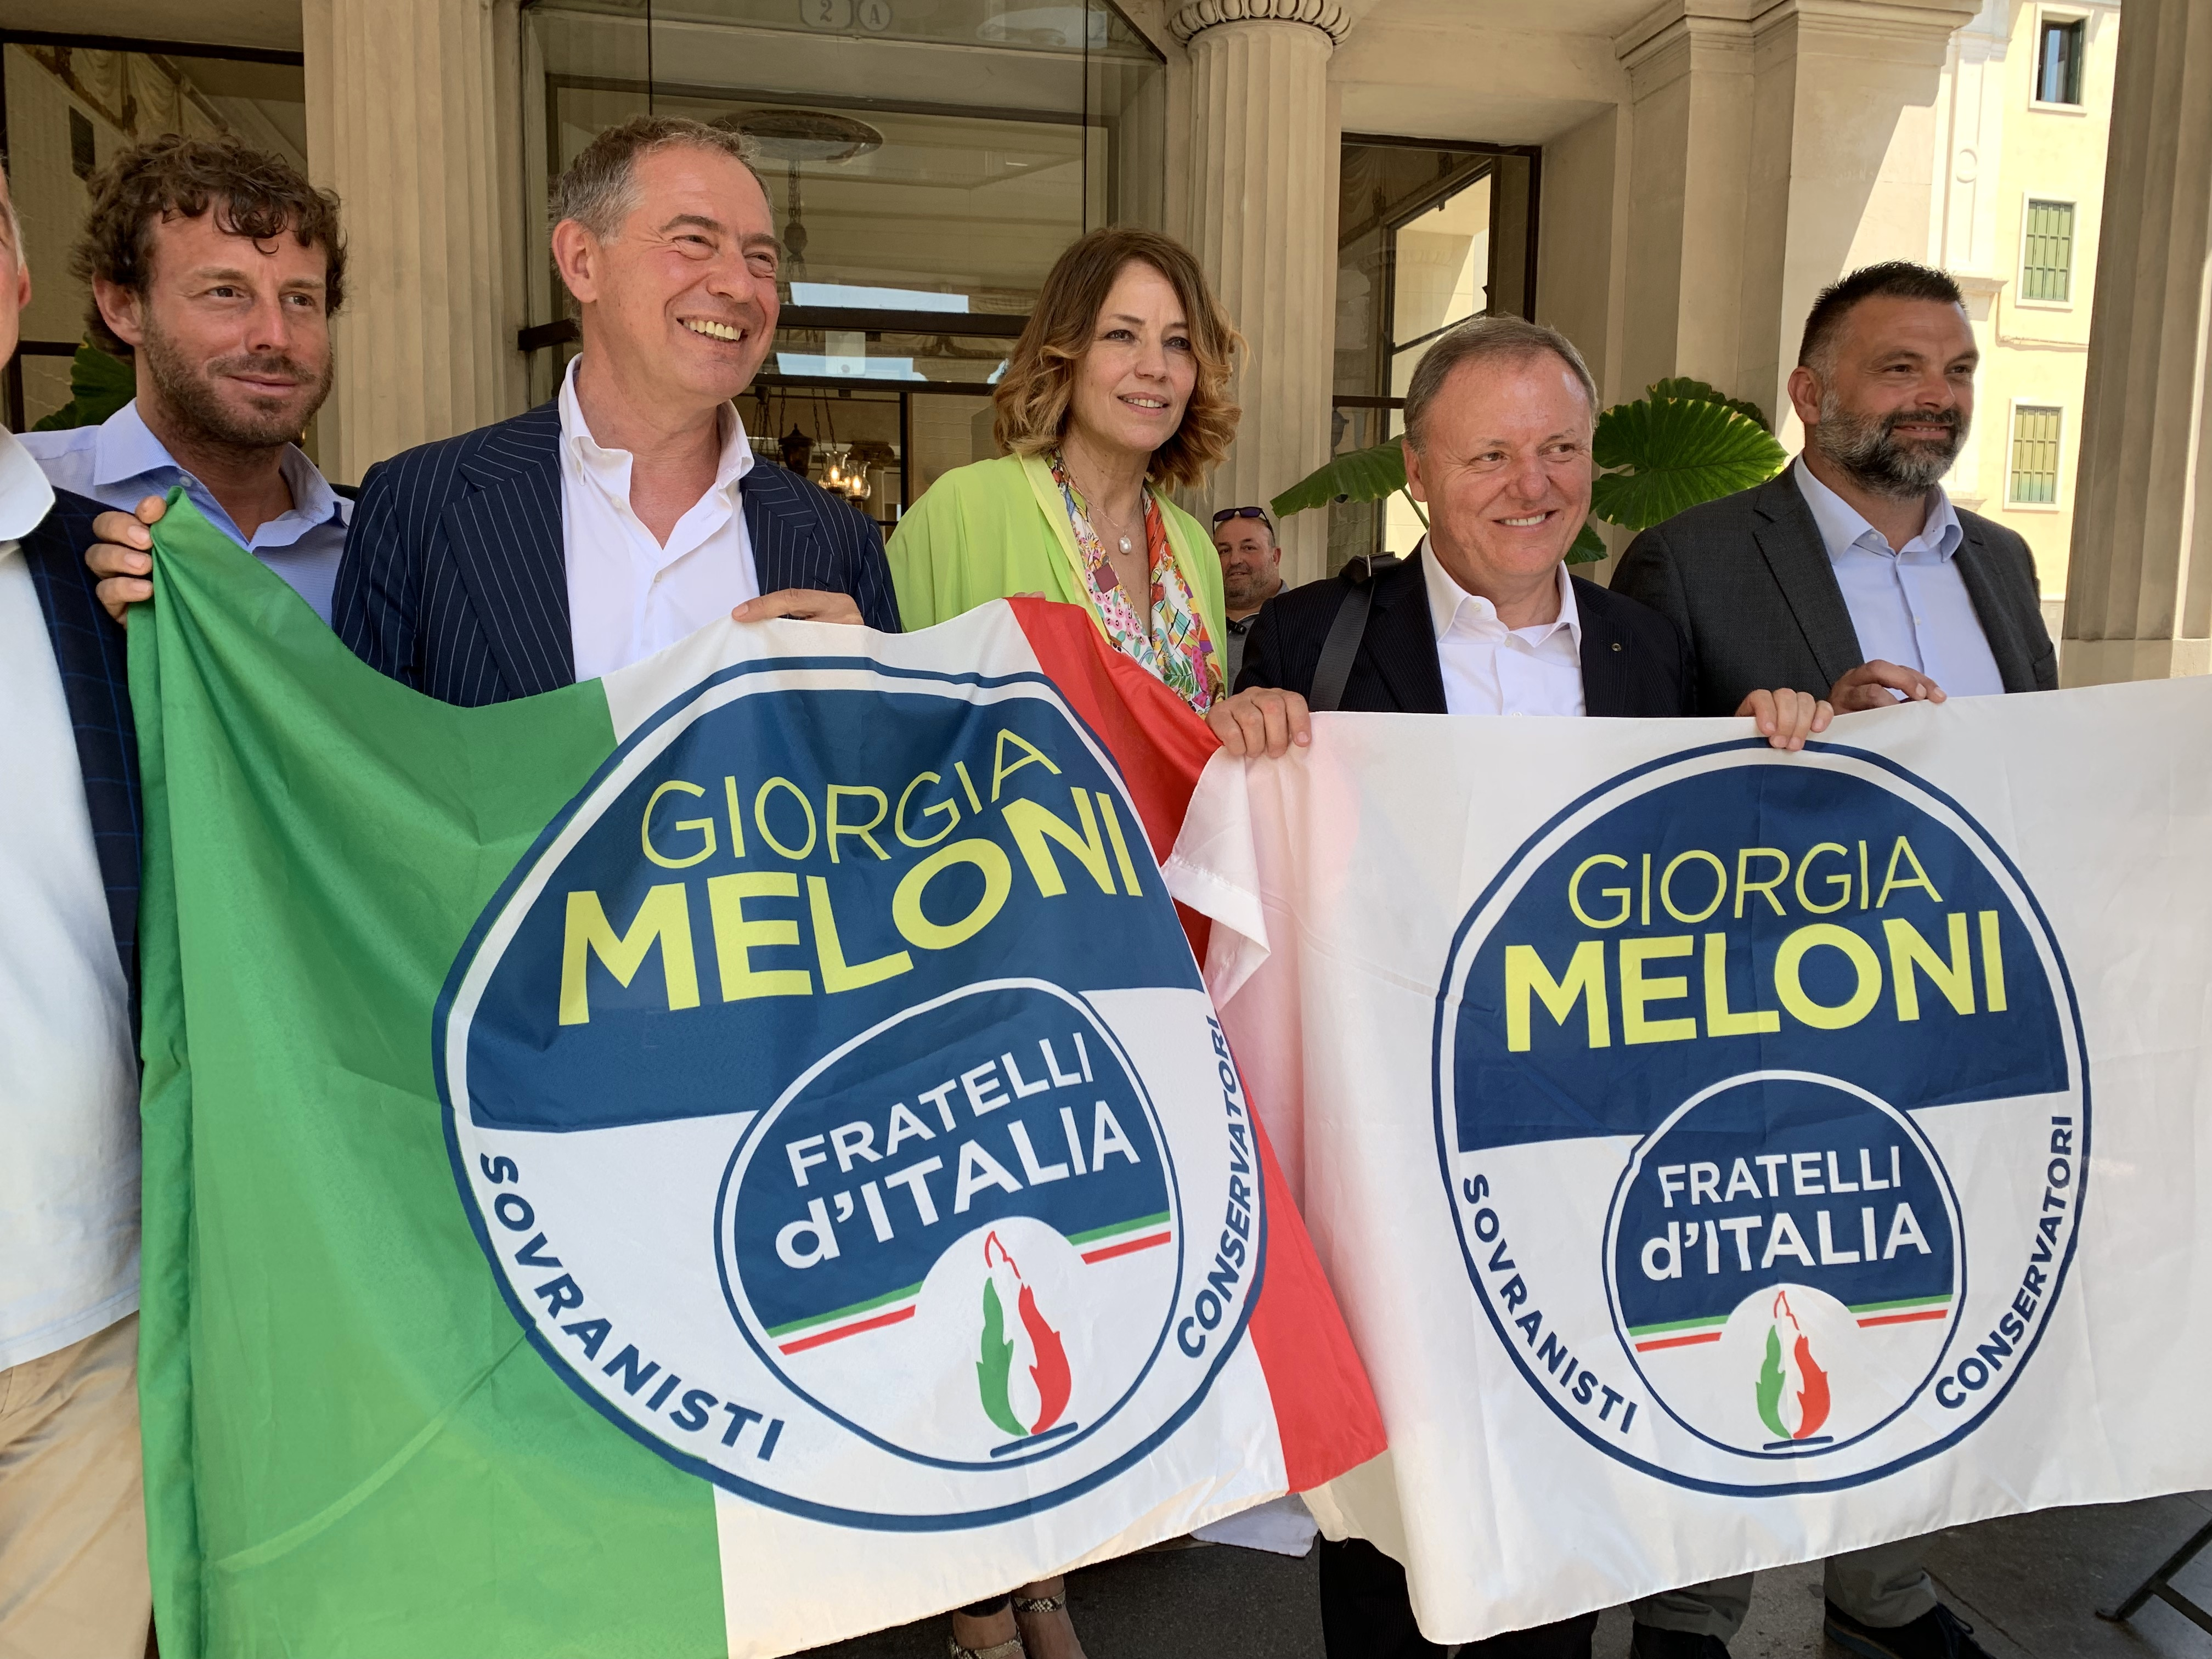 fratelli d'italia Elisabetta Gardini-2